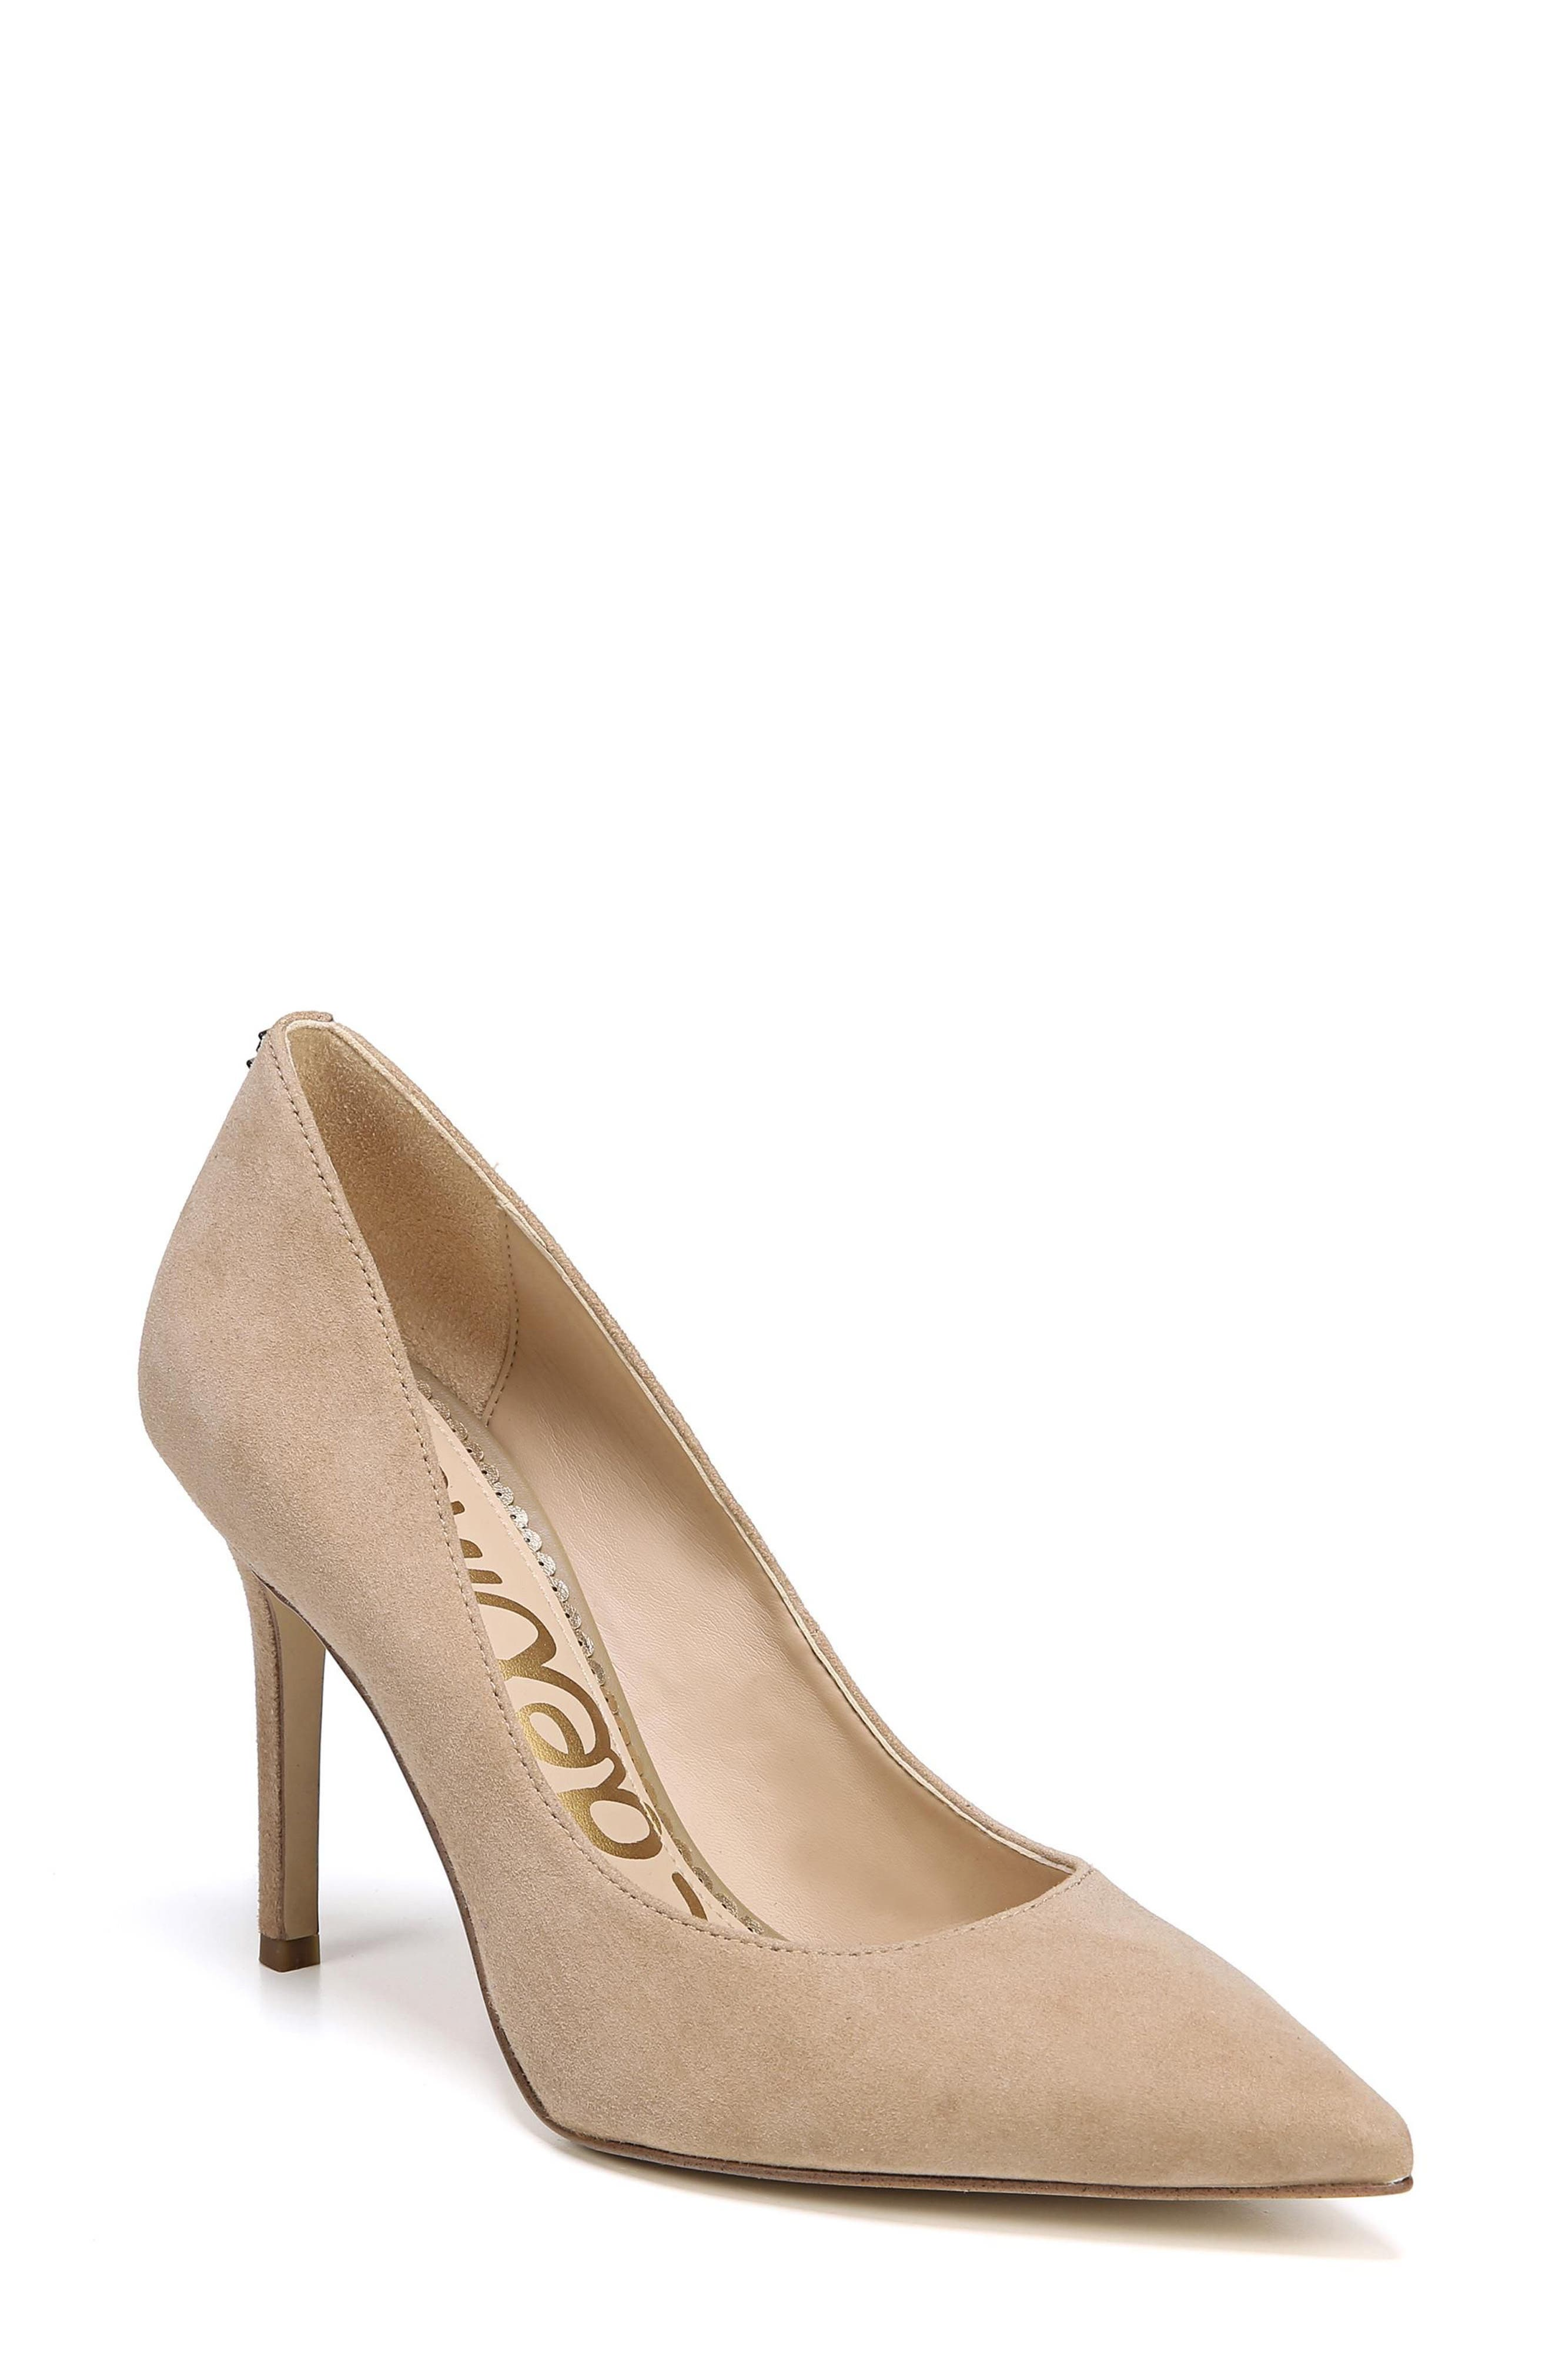 shoes for stylish petite women